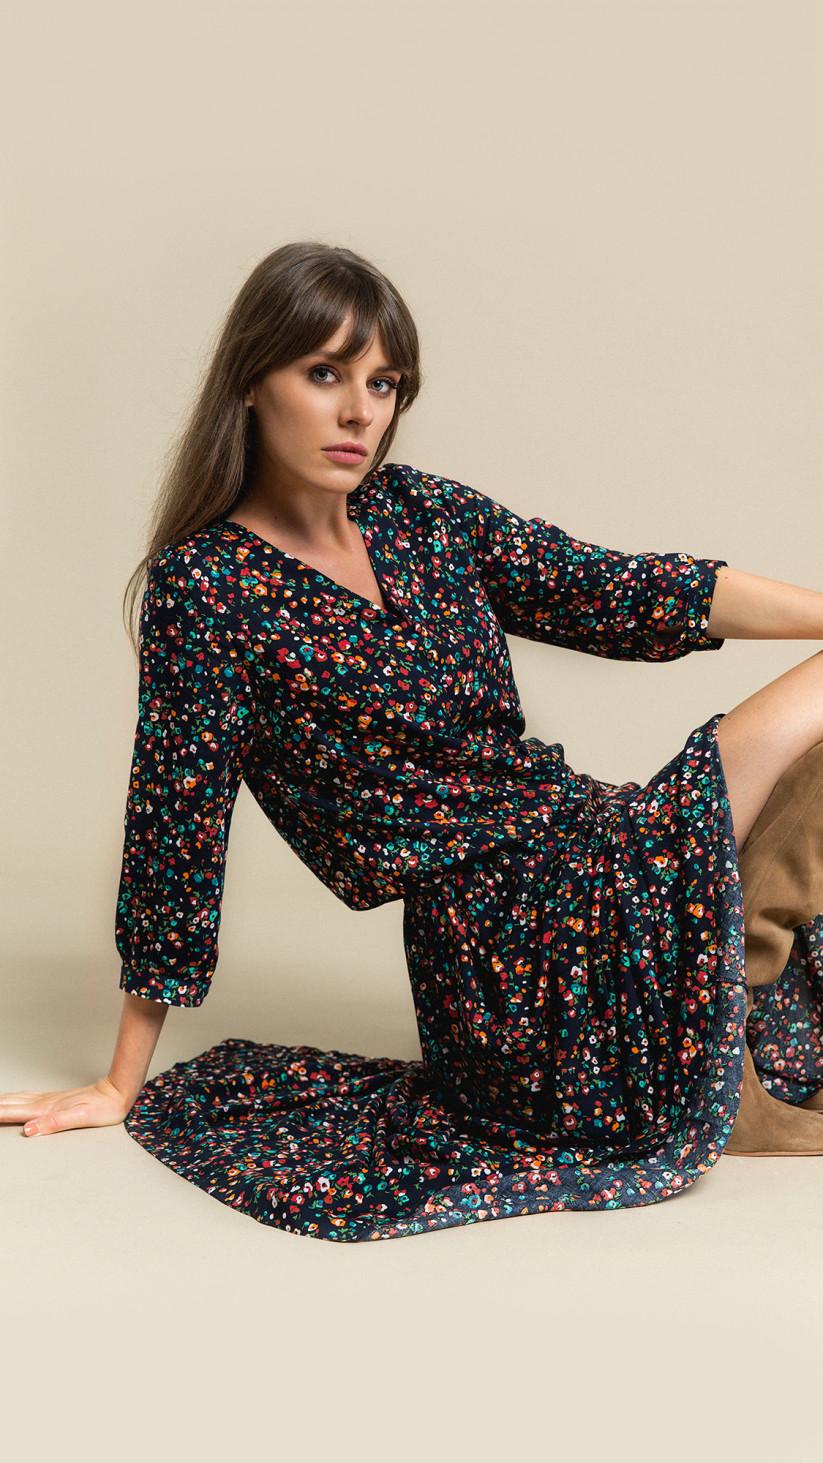 Sukienka Lana | Granat Multikolor | Rozkloszowana maxi z rozporkiem i rękawem 3/4